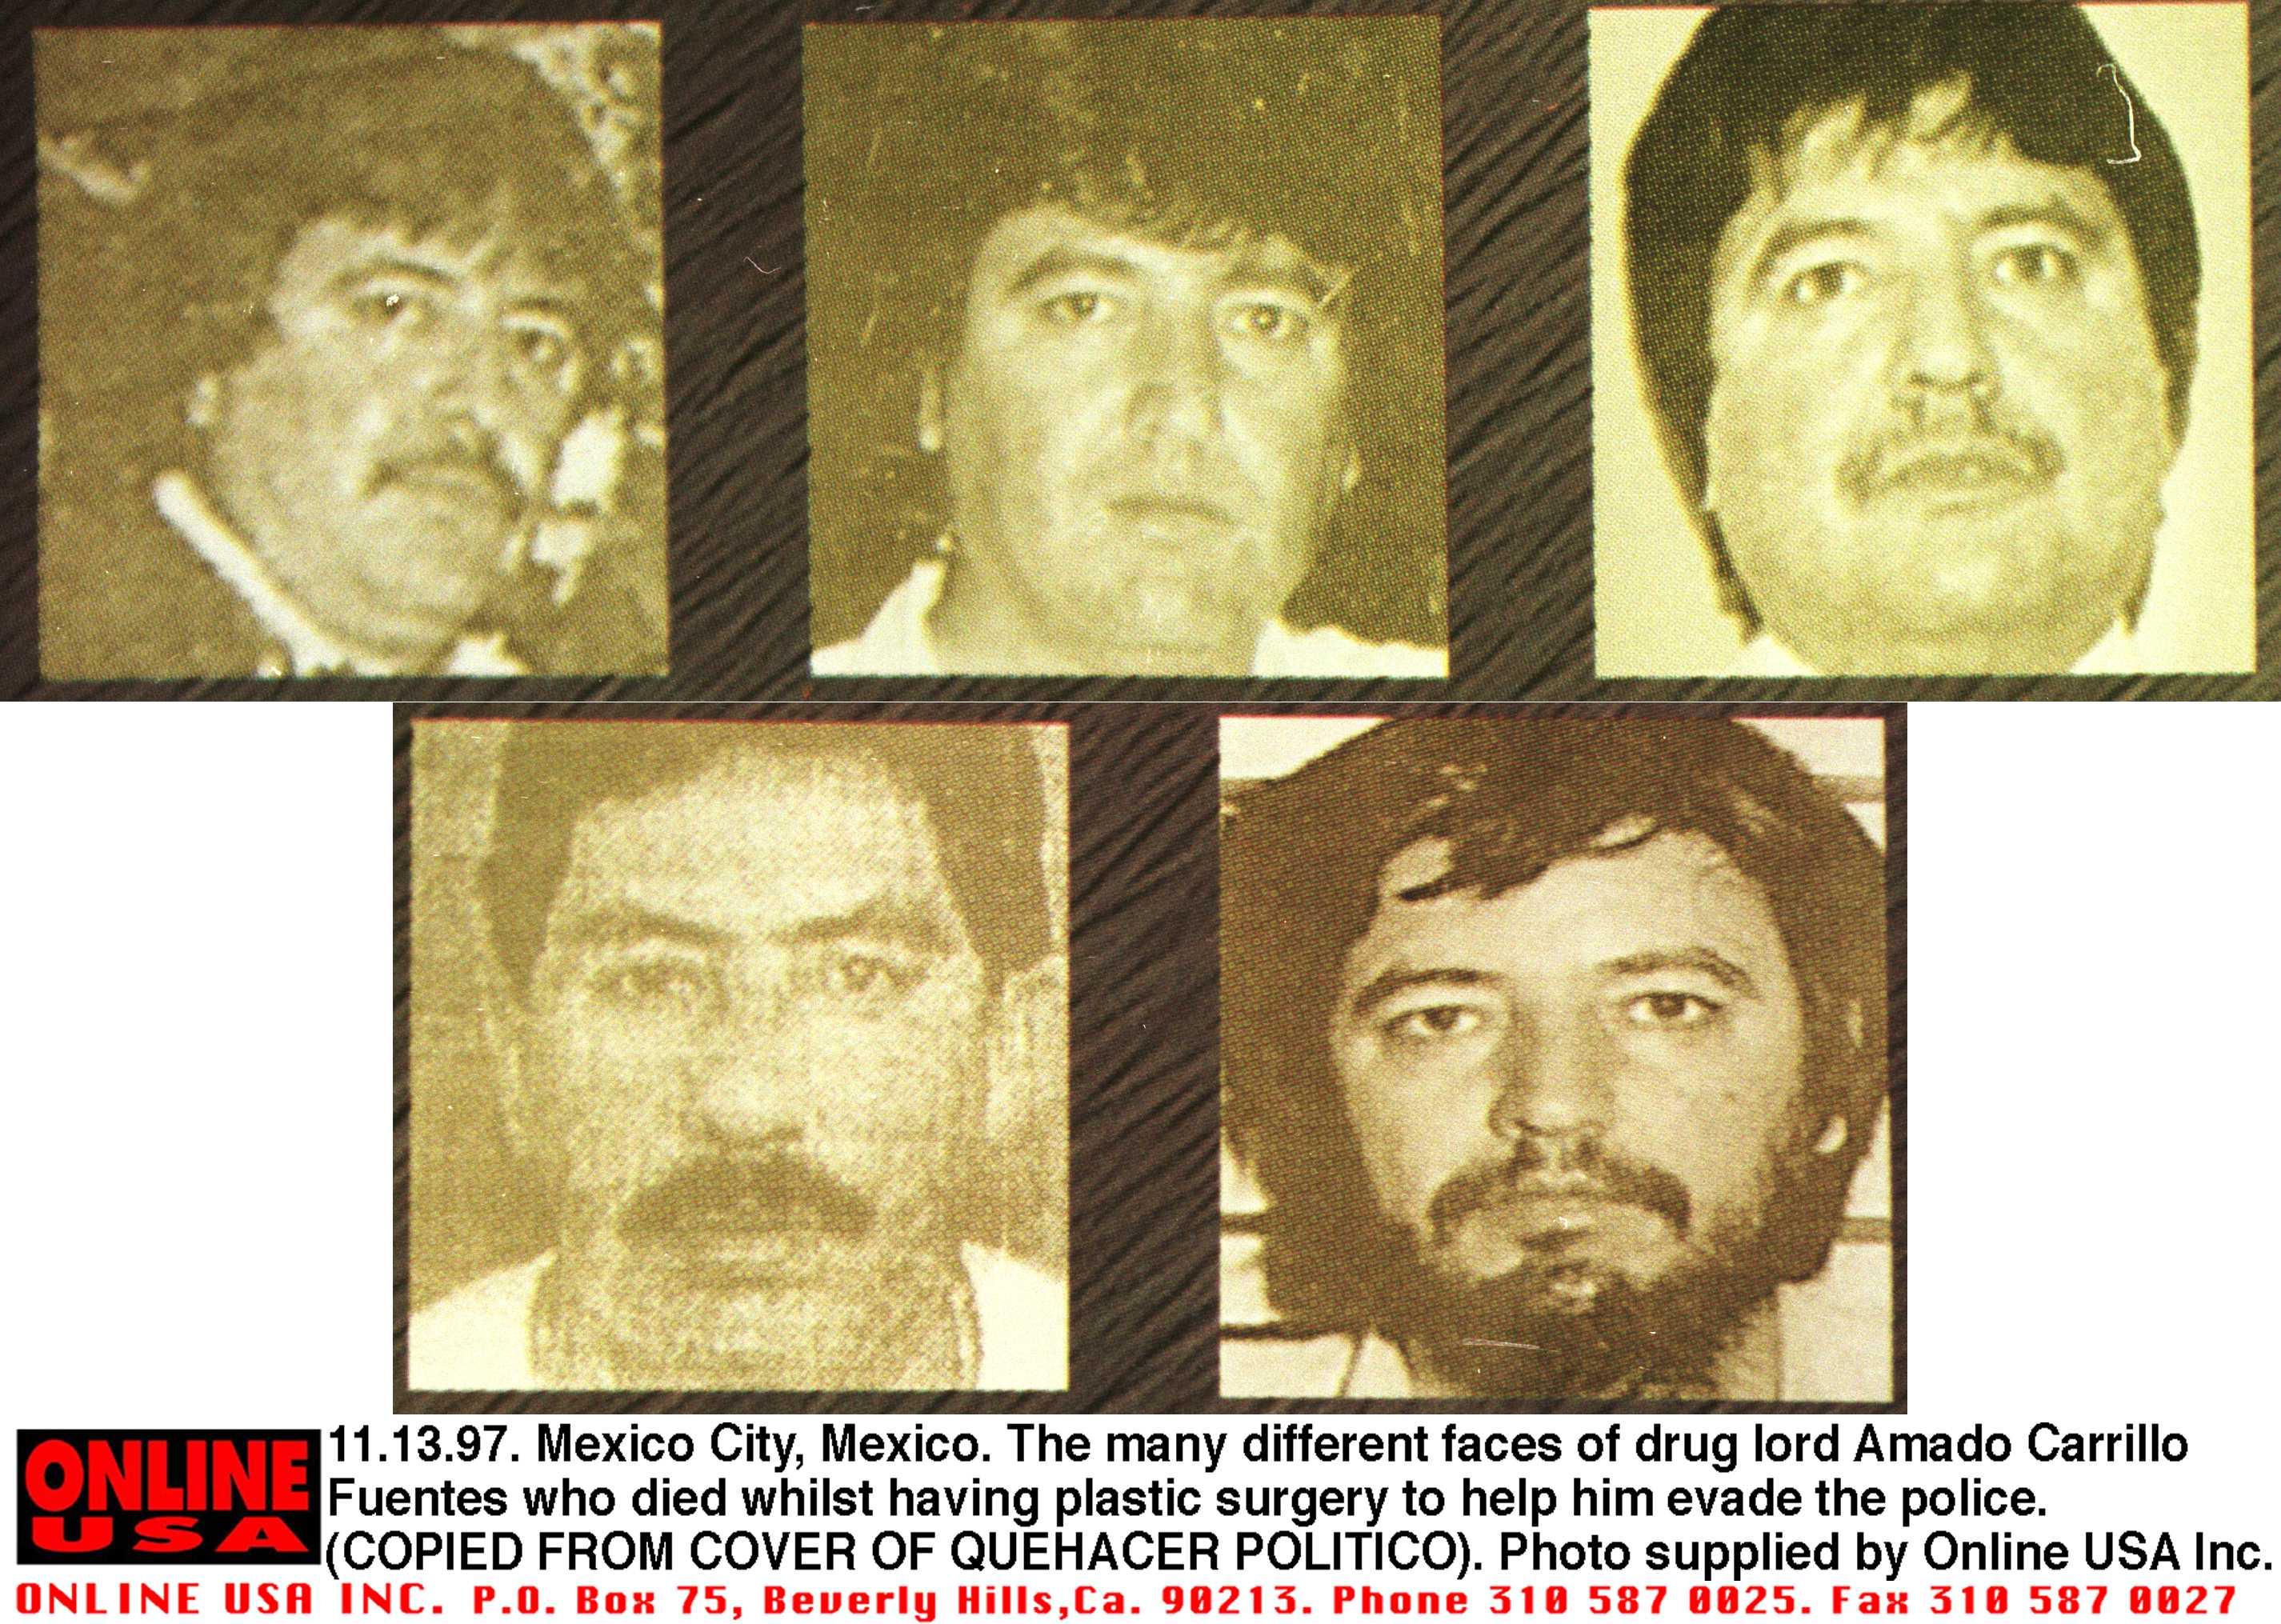 Wanted photos of Amado Carrillo Fuentes